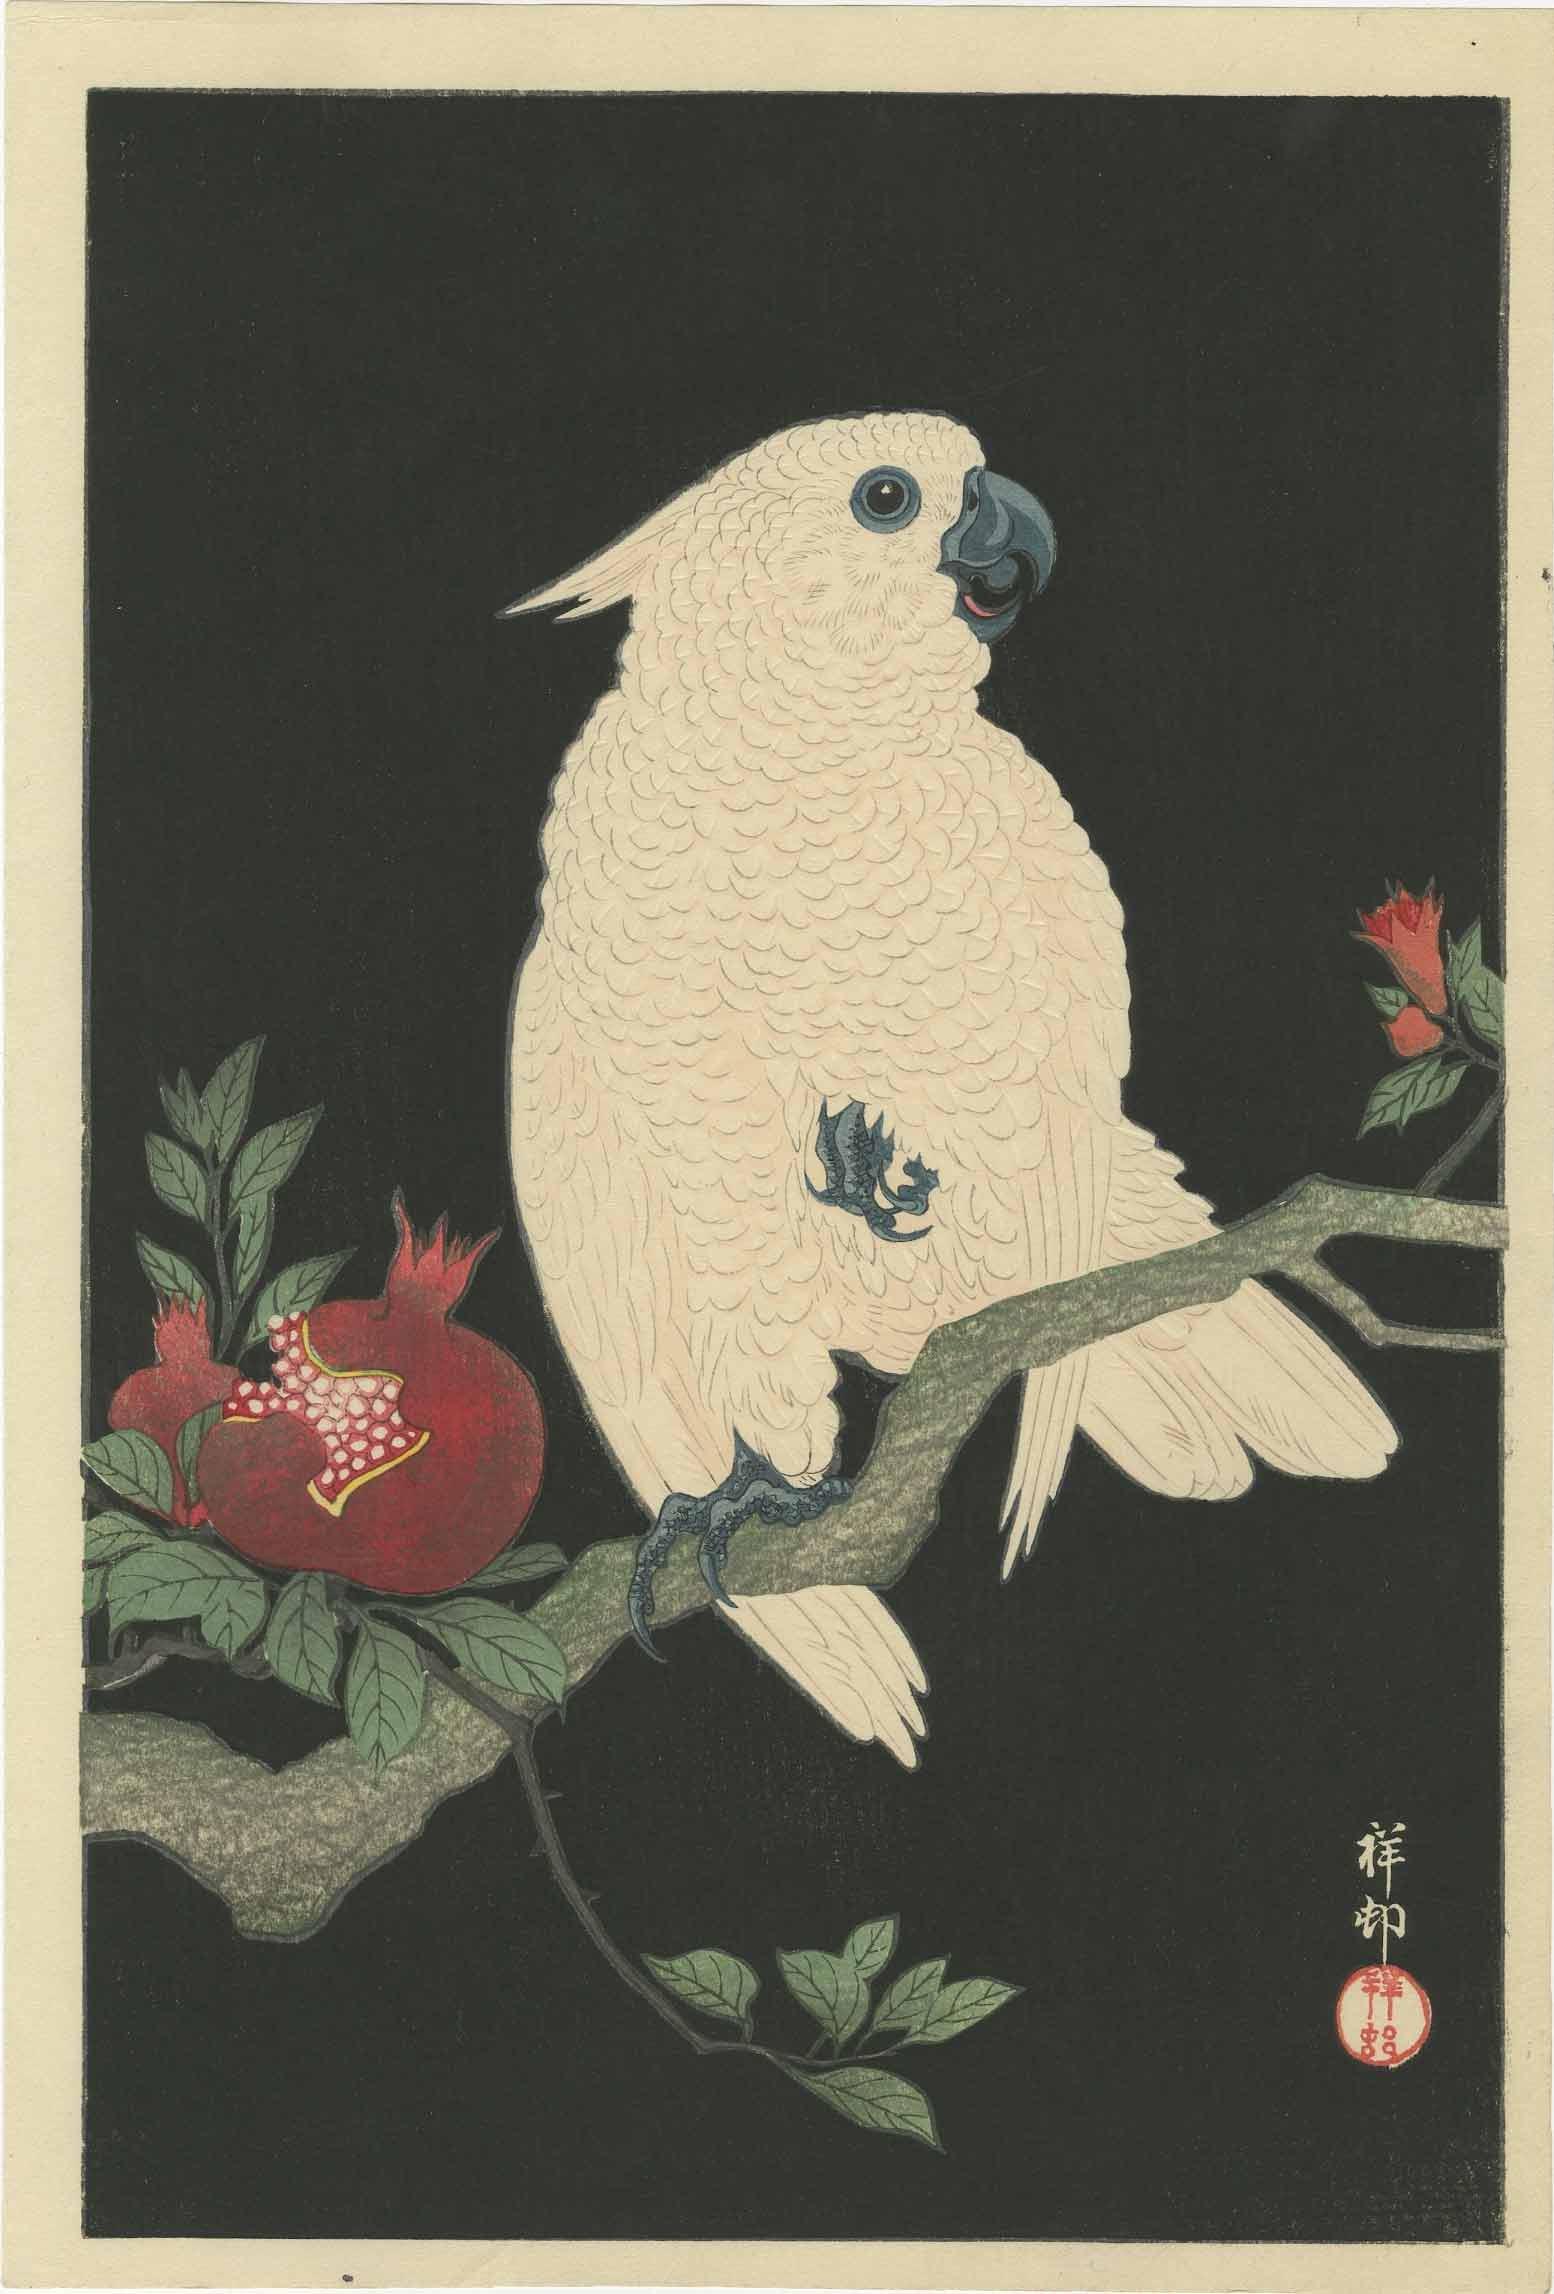 Ohara Koson - Cockatoo and Pomegranate 1927 woodblock